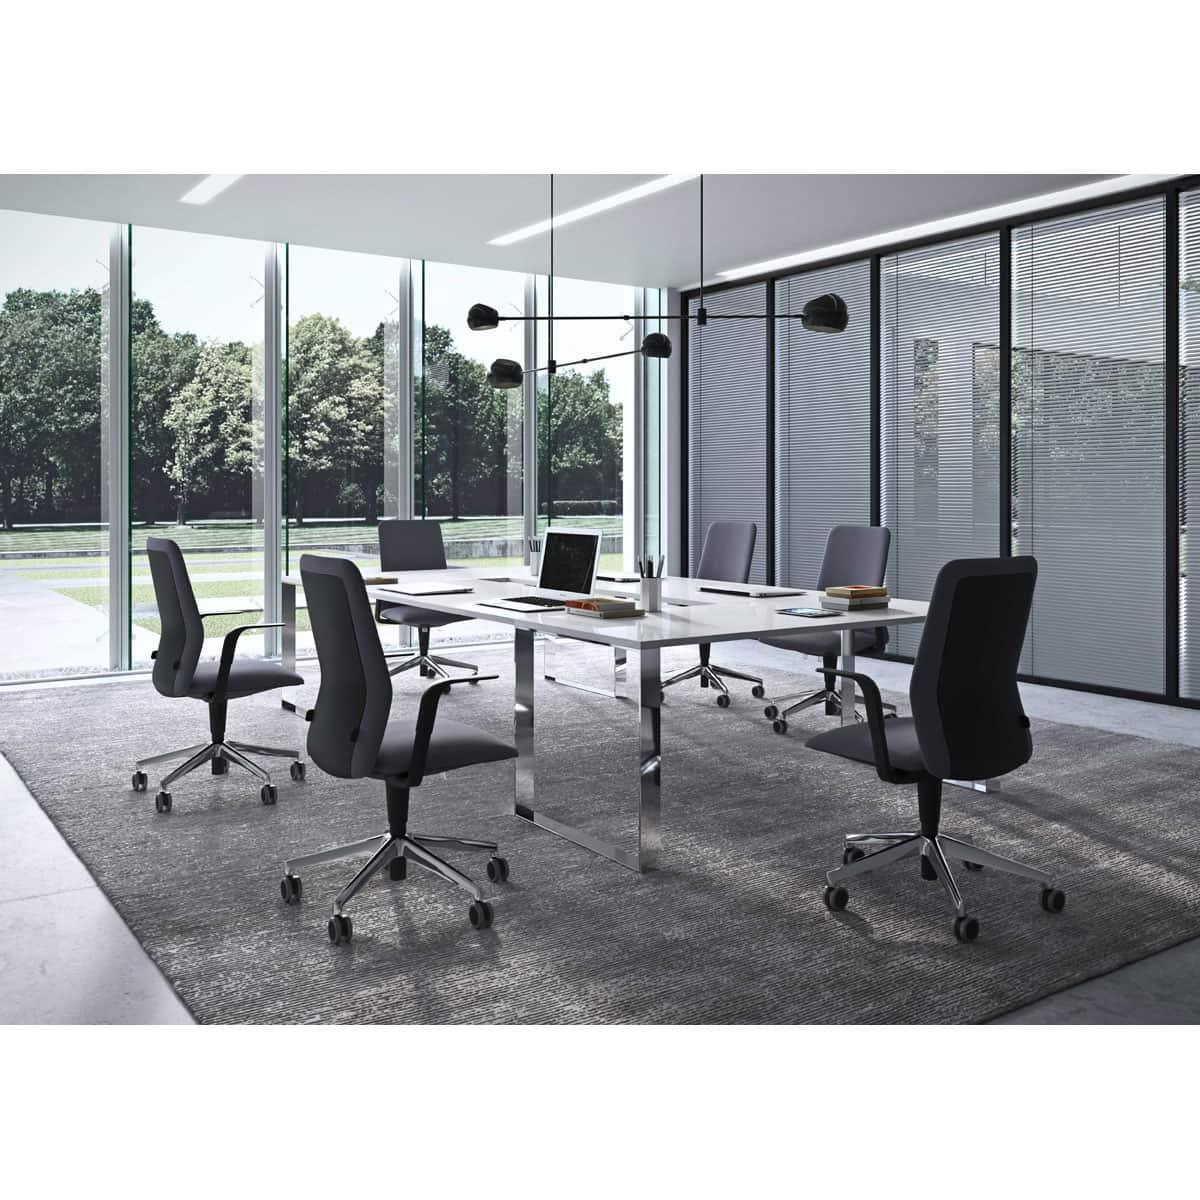 Kastel KAPPA Bürodrehstuhl, individuell konfigurierbar